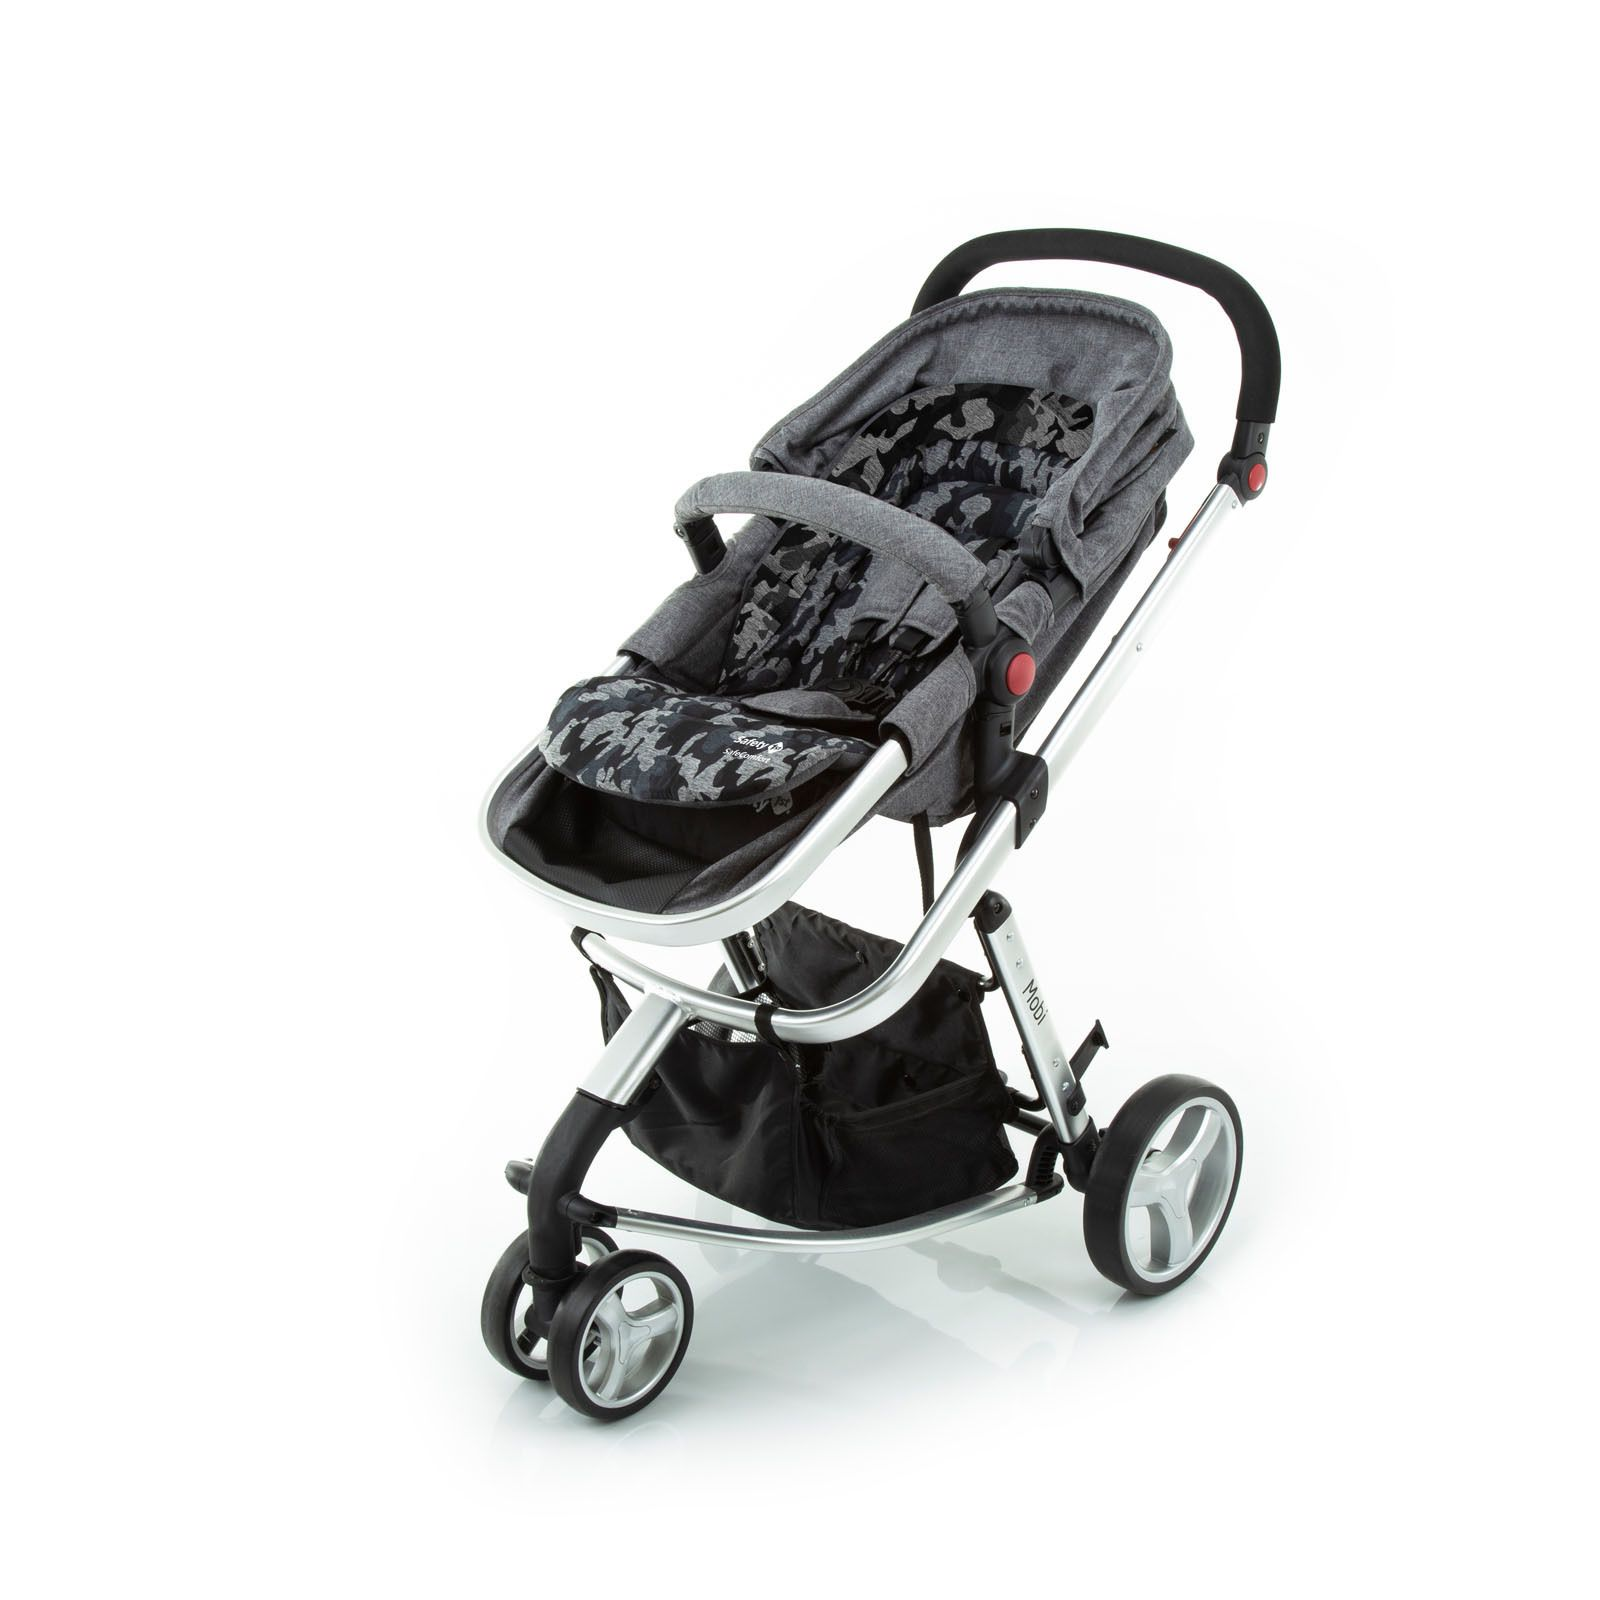 Almofada Safecomfort Grey Army - Safety Ref Imp01438